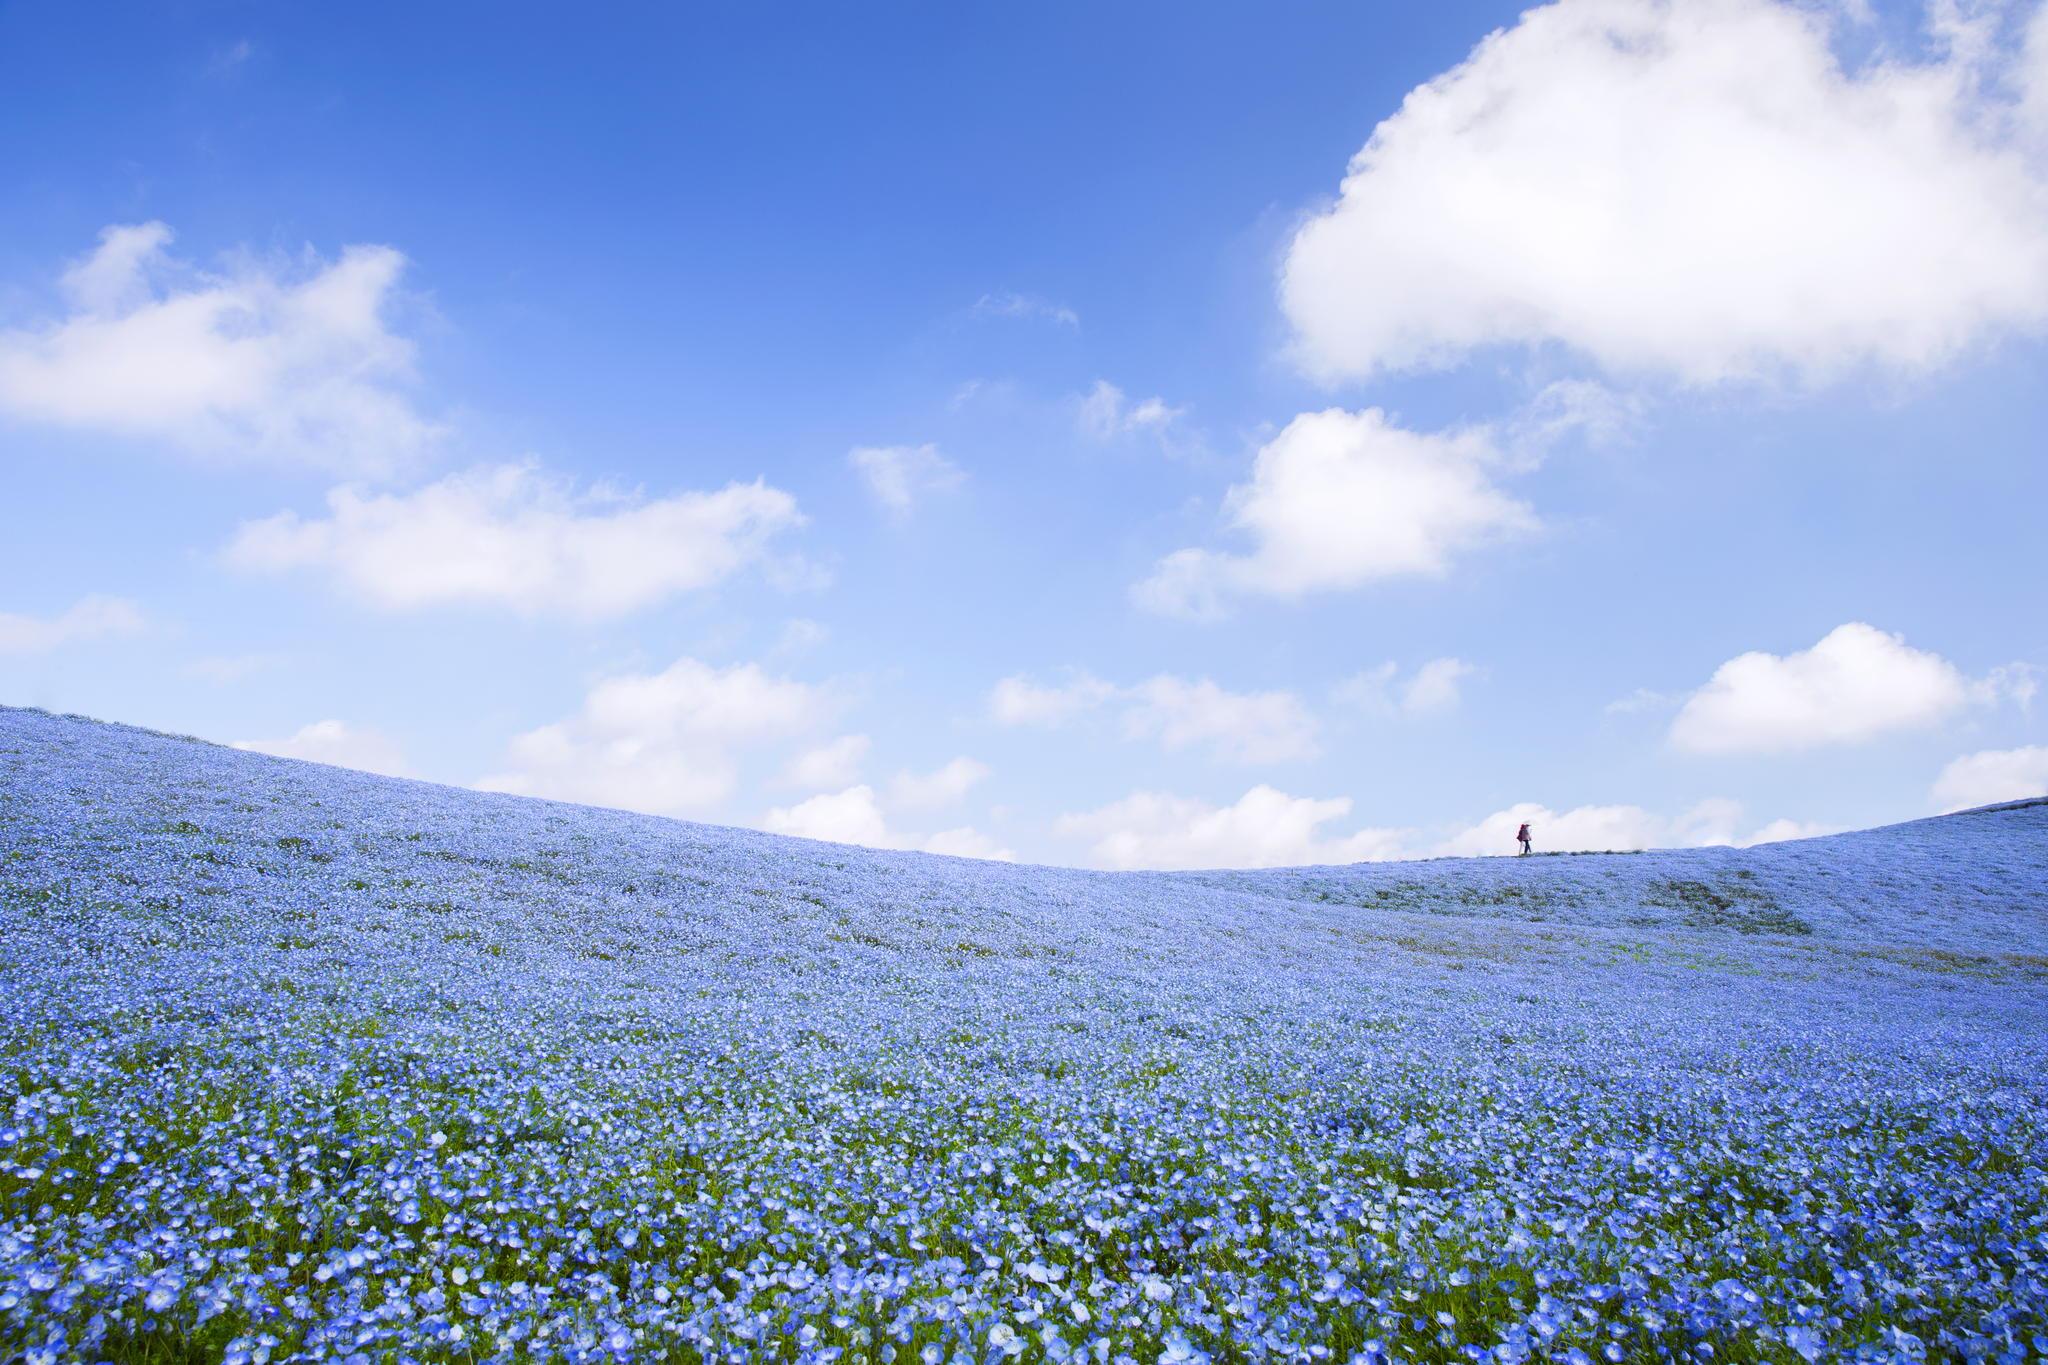 hitachi-seaside-park-nemophila-4